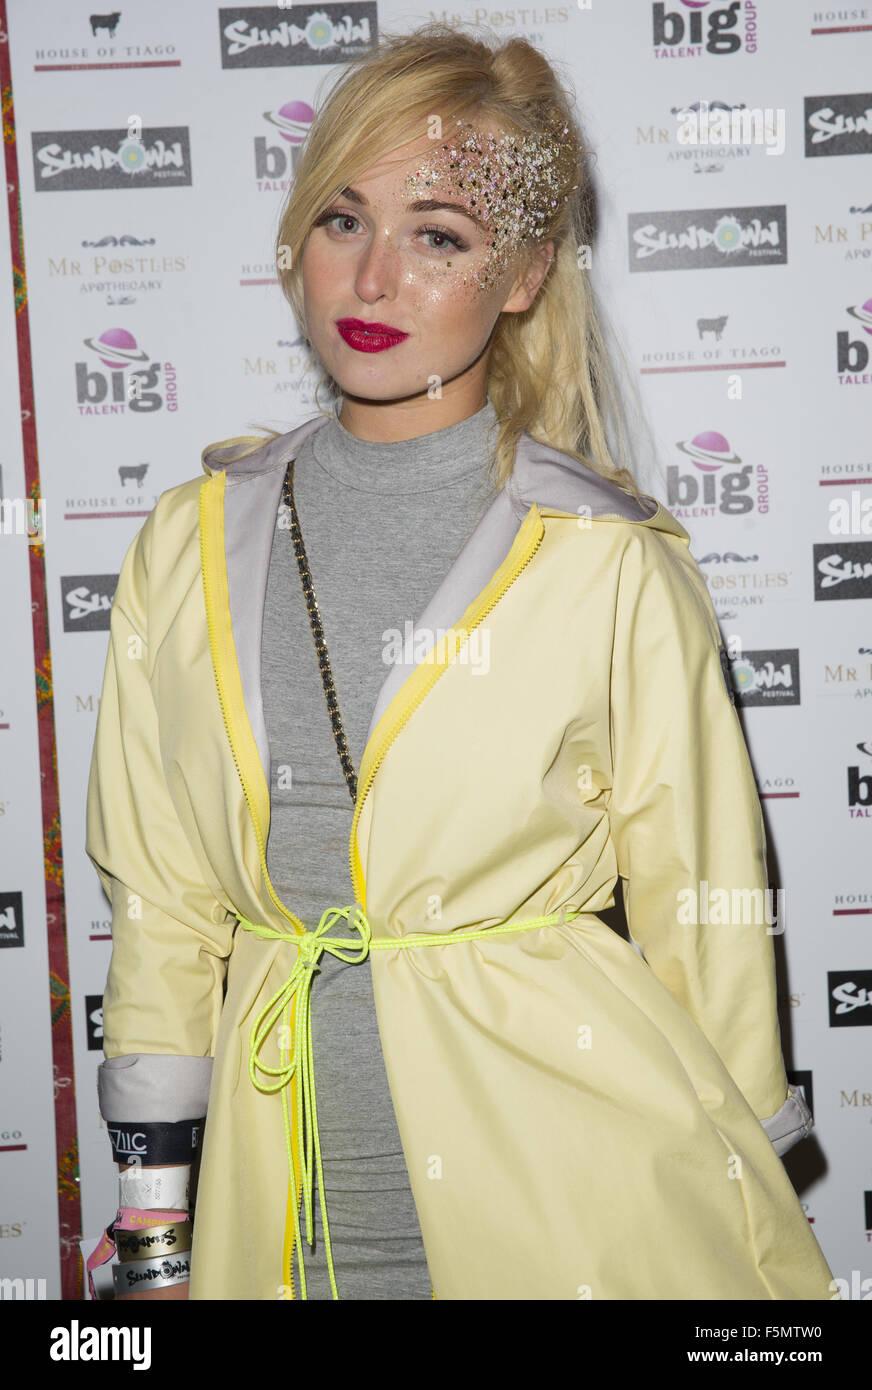 Celebrities at Sundown Festival  Featuring: jorgie porter Where: Norwich, United Kingdom When: 05 Sep 2015 - Stock Image